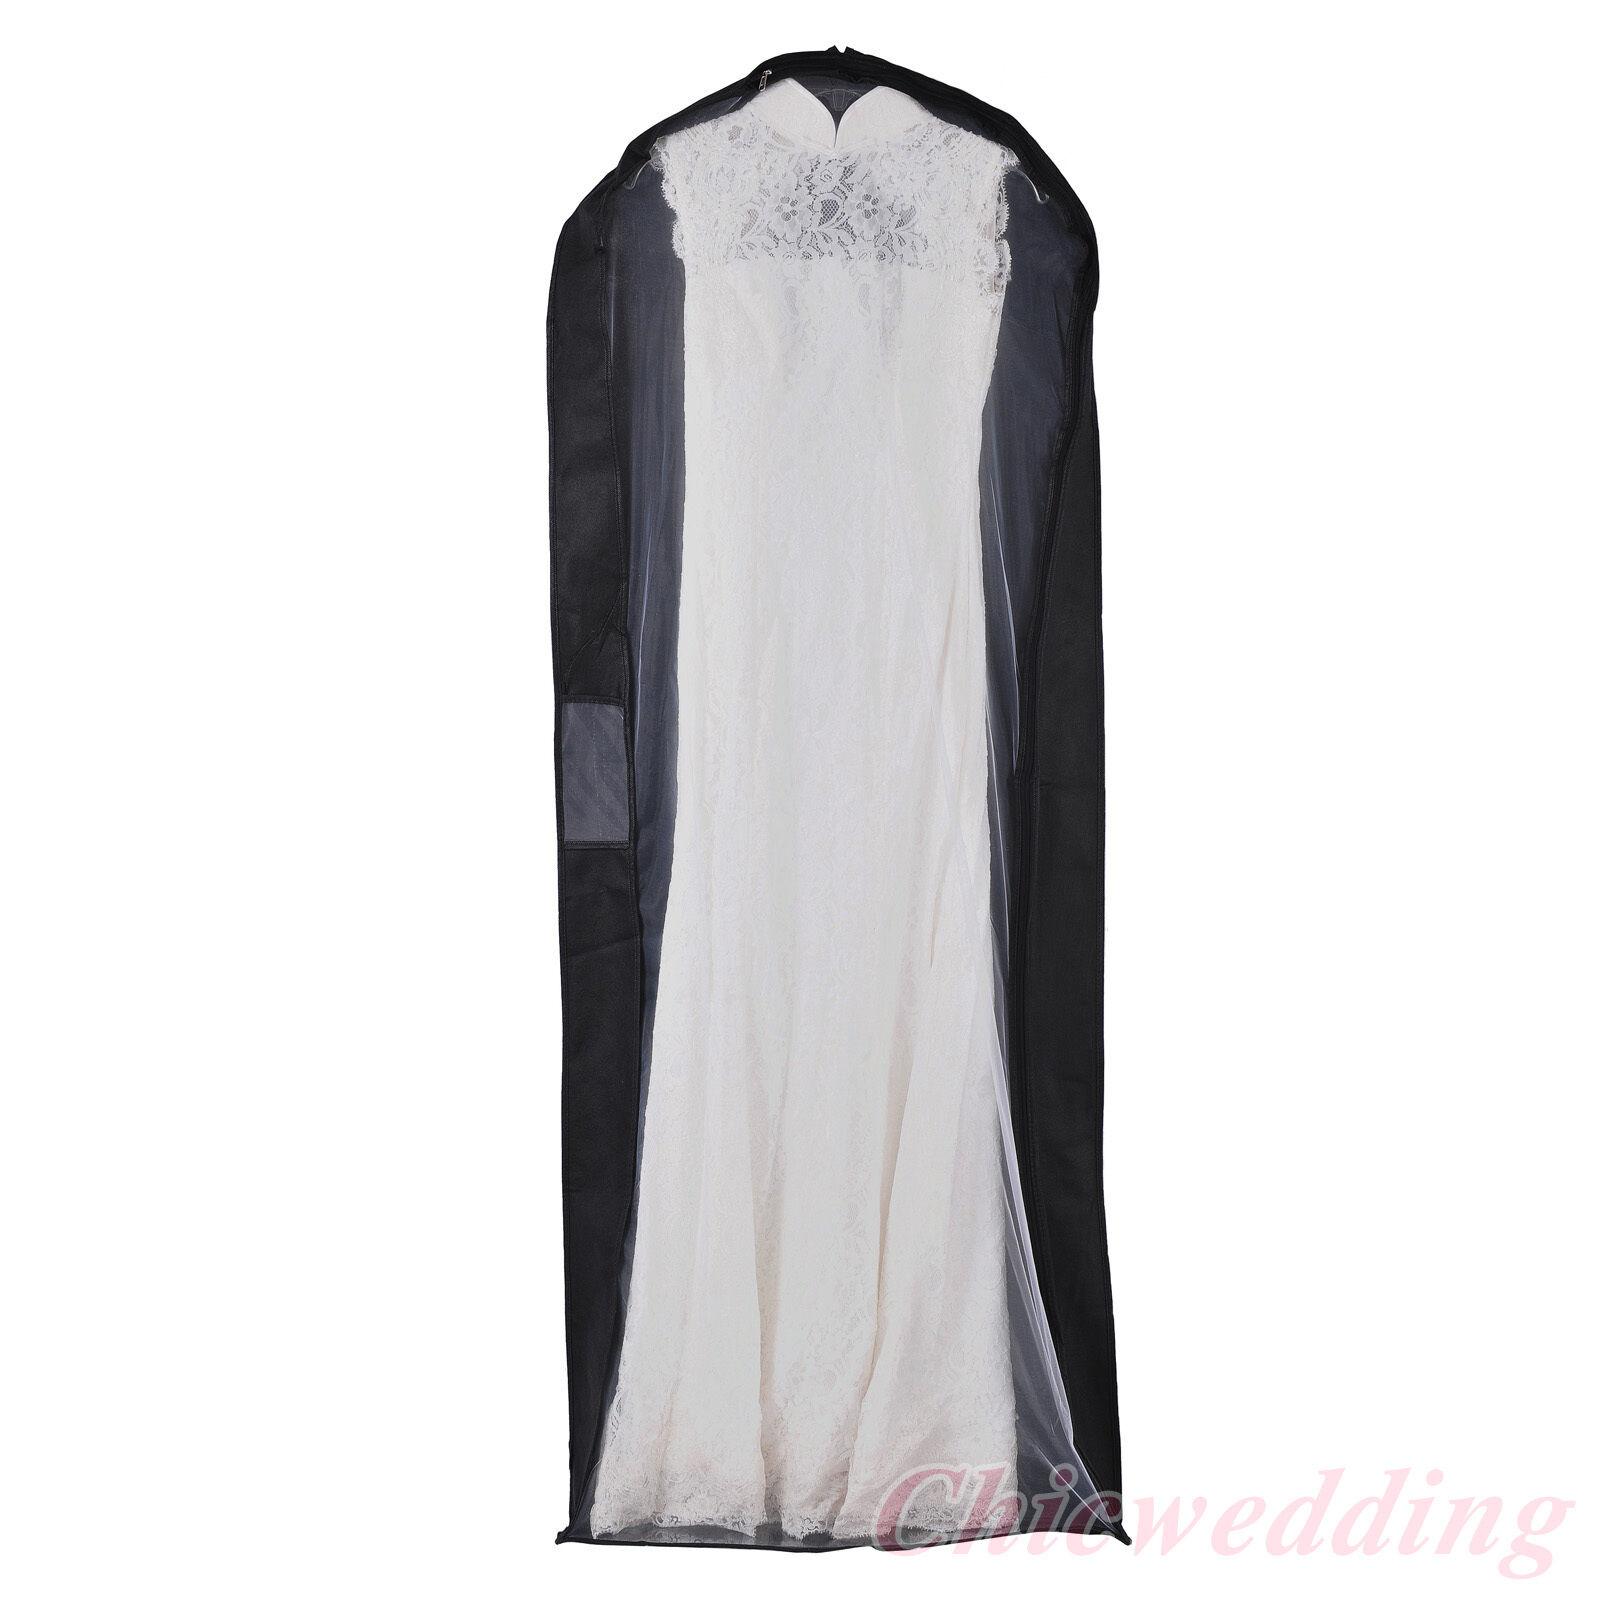 Wediding Travel Garment Bags Wedding/evening Ball Gown Dress Suit ...